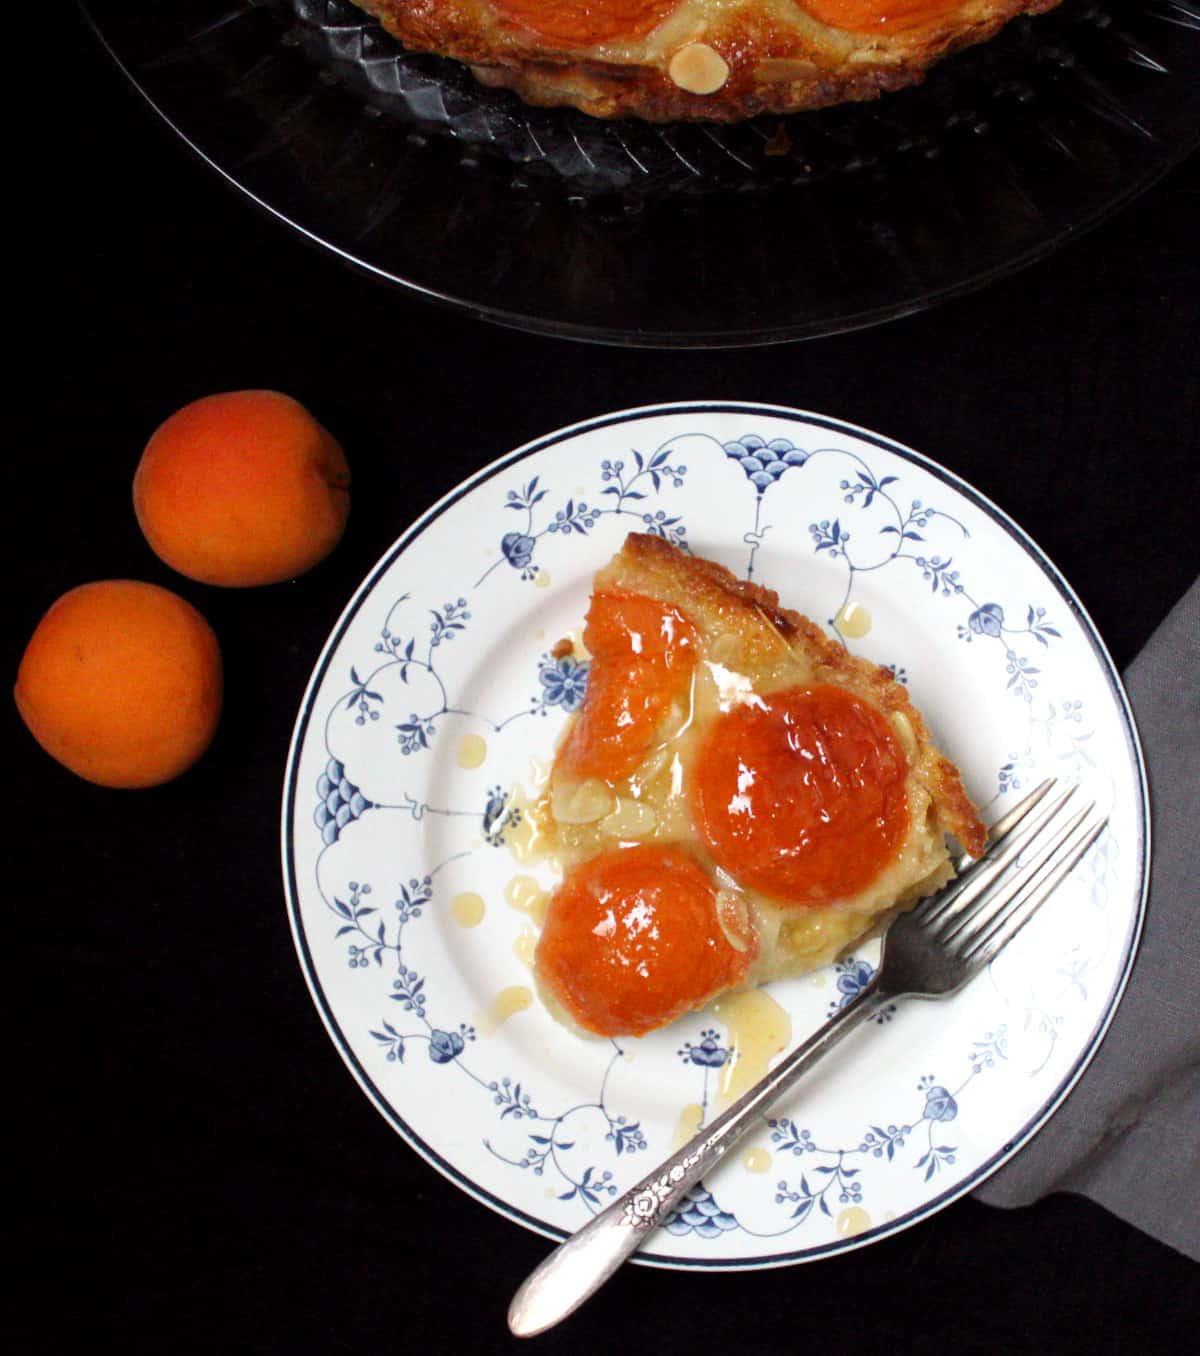 Overhead closeup of a vegan apricot frangipane tart with a silver fork.